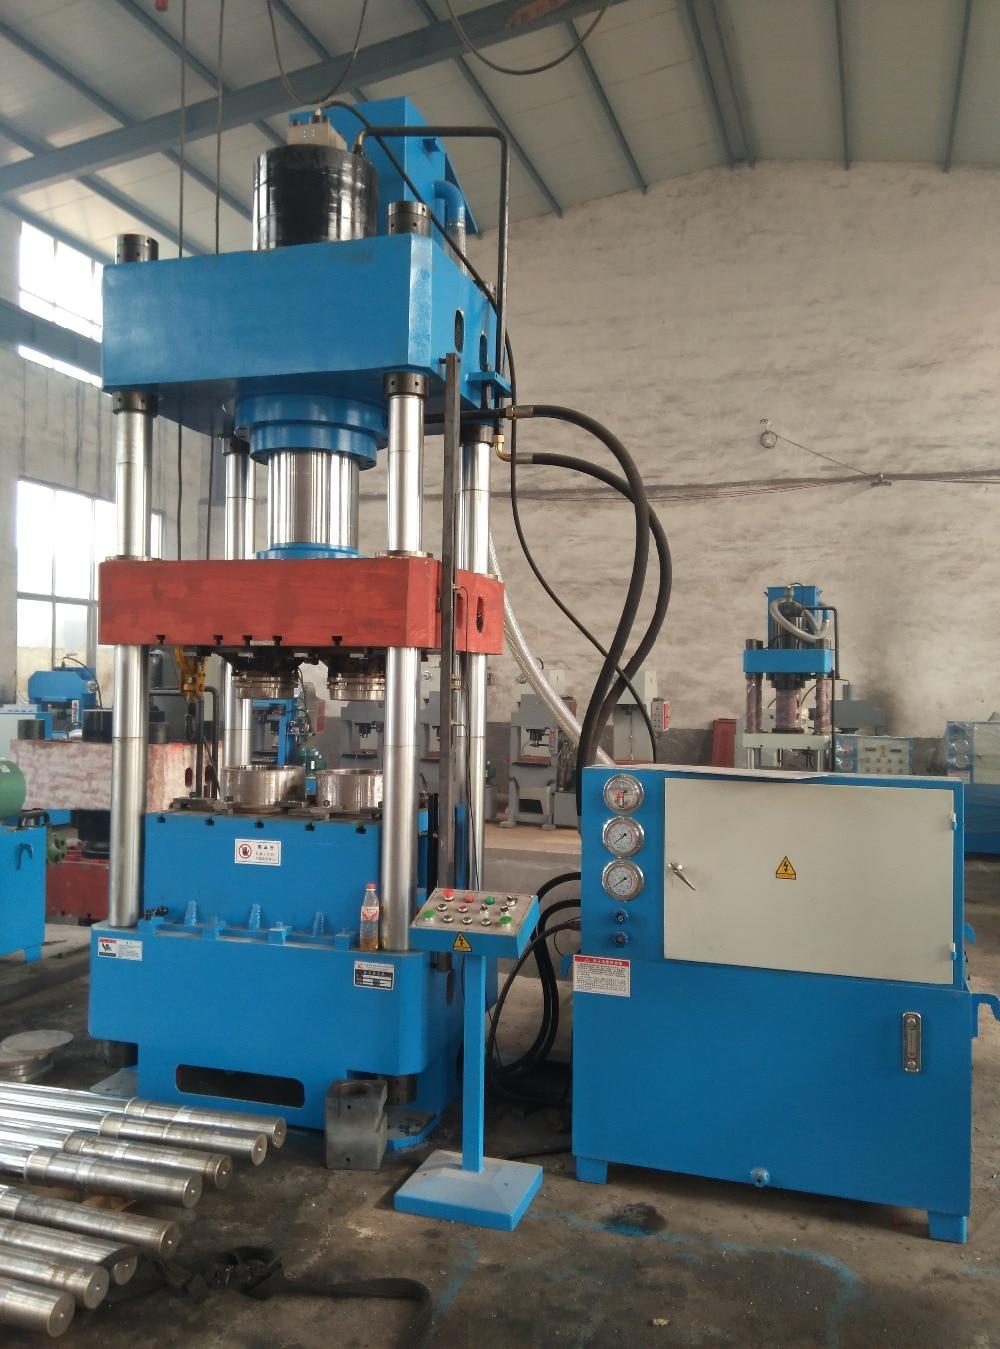 YTD32 160TB electric hydraulic press machine shop machinery tools